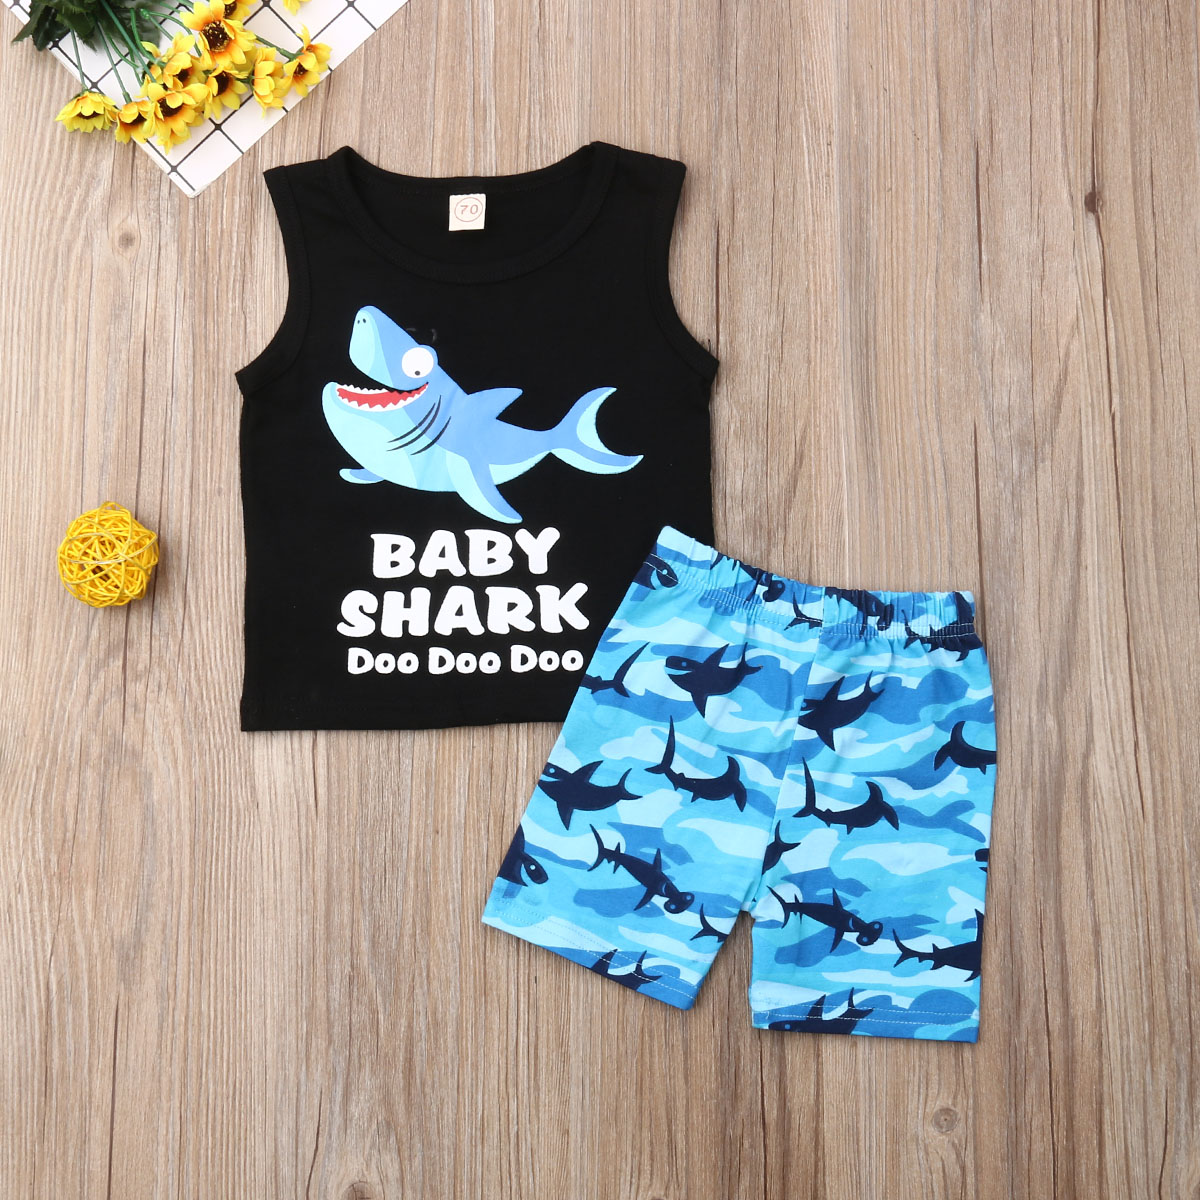 US Toddler Kids Baby Boys Clothes Shark Print T-shirt Tops Shorts Outfits Set